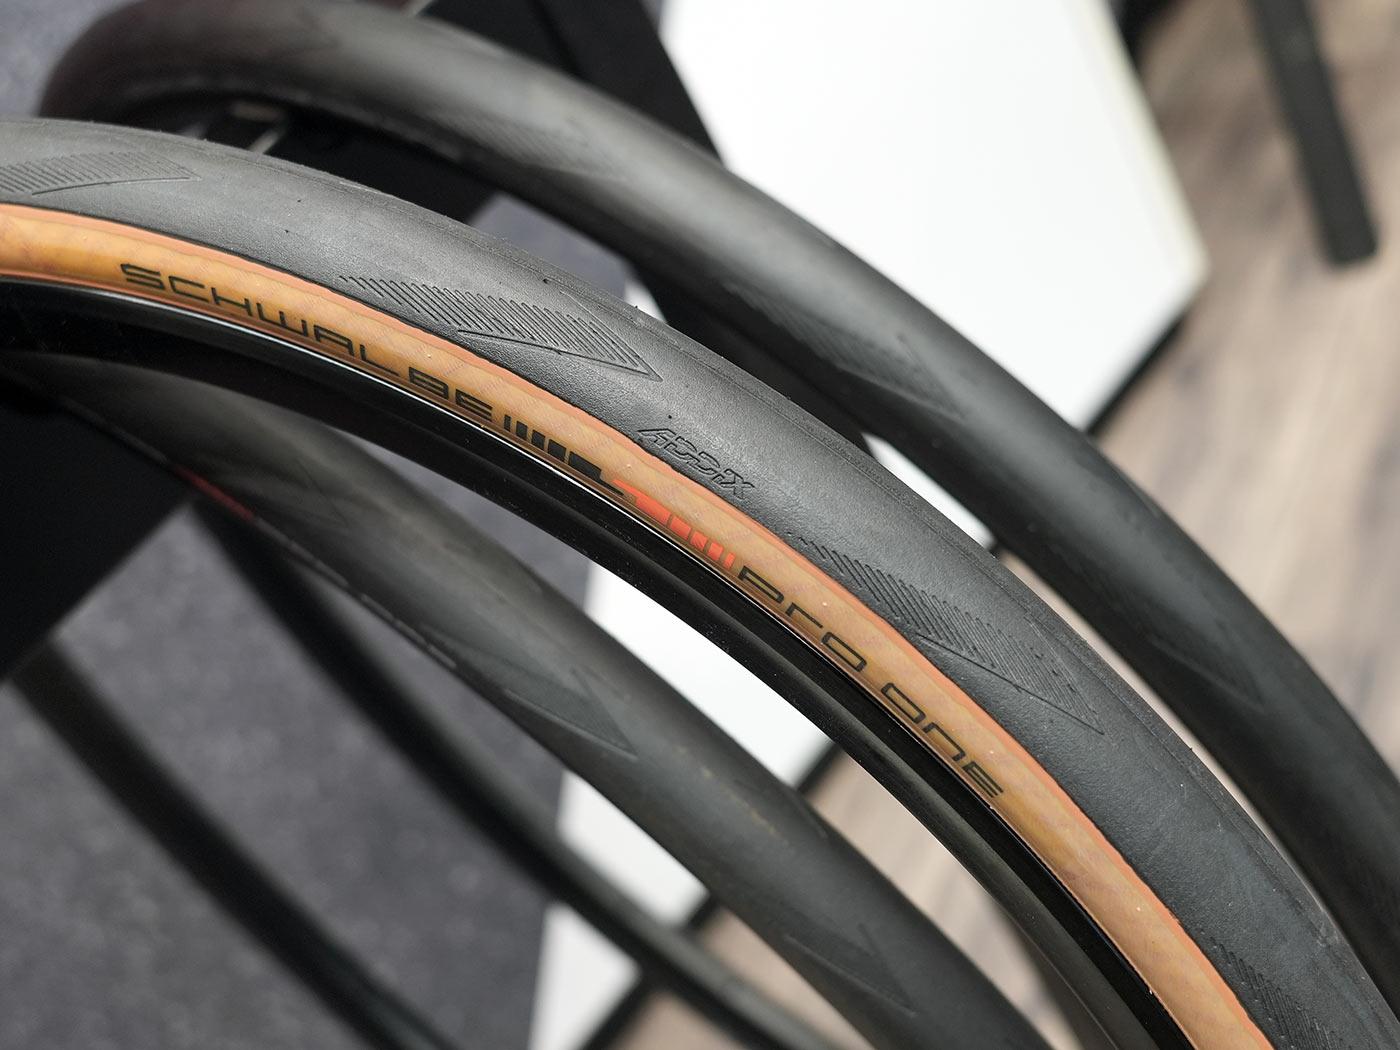 new 700x32 schwalbe pro one tube type road bike tire